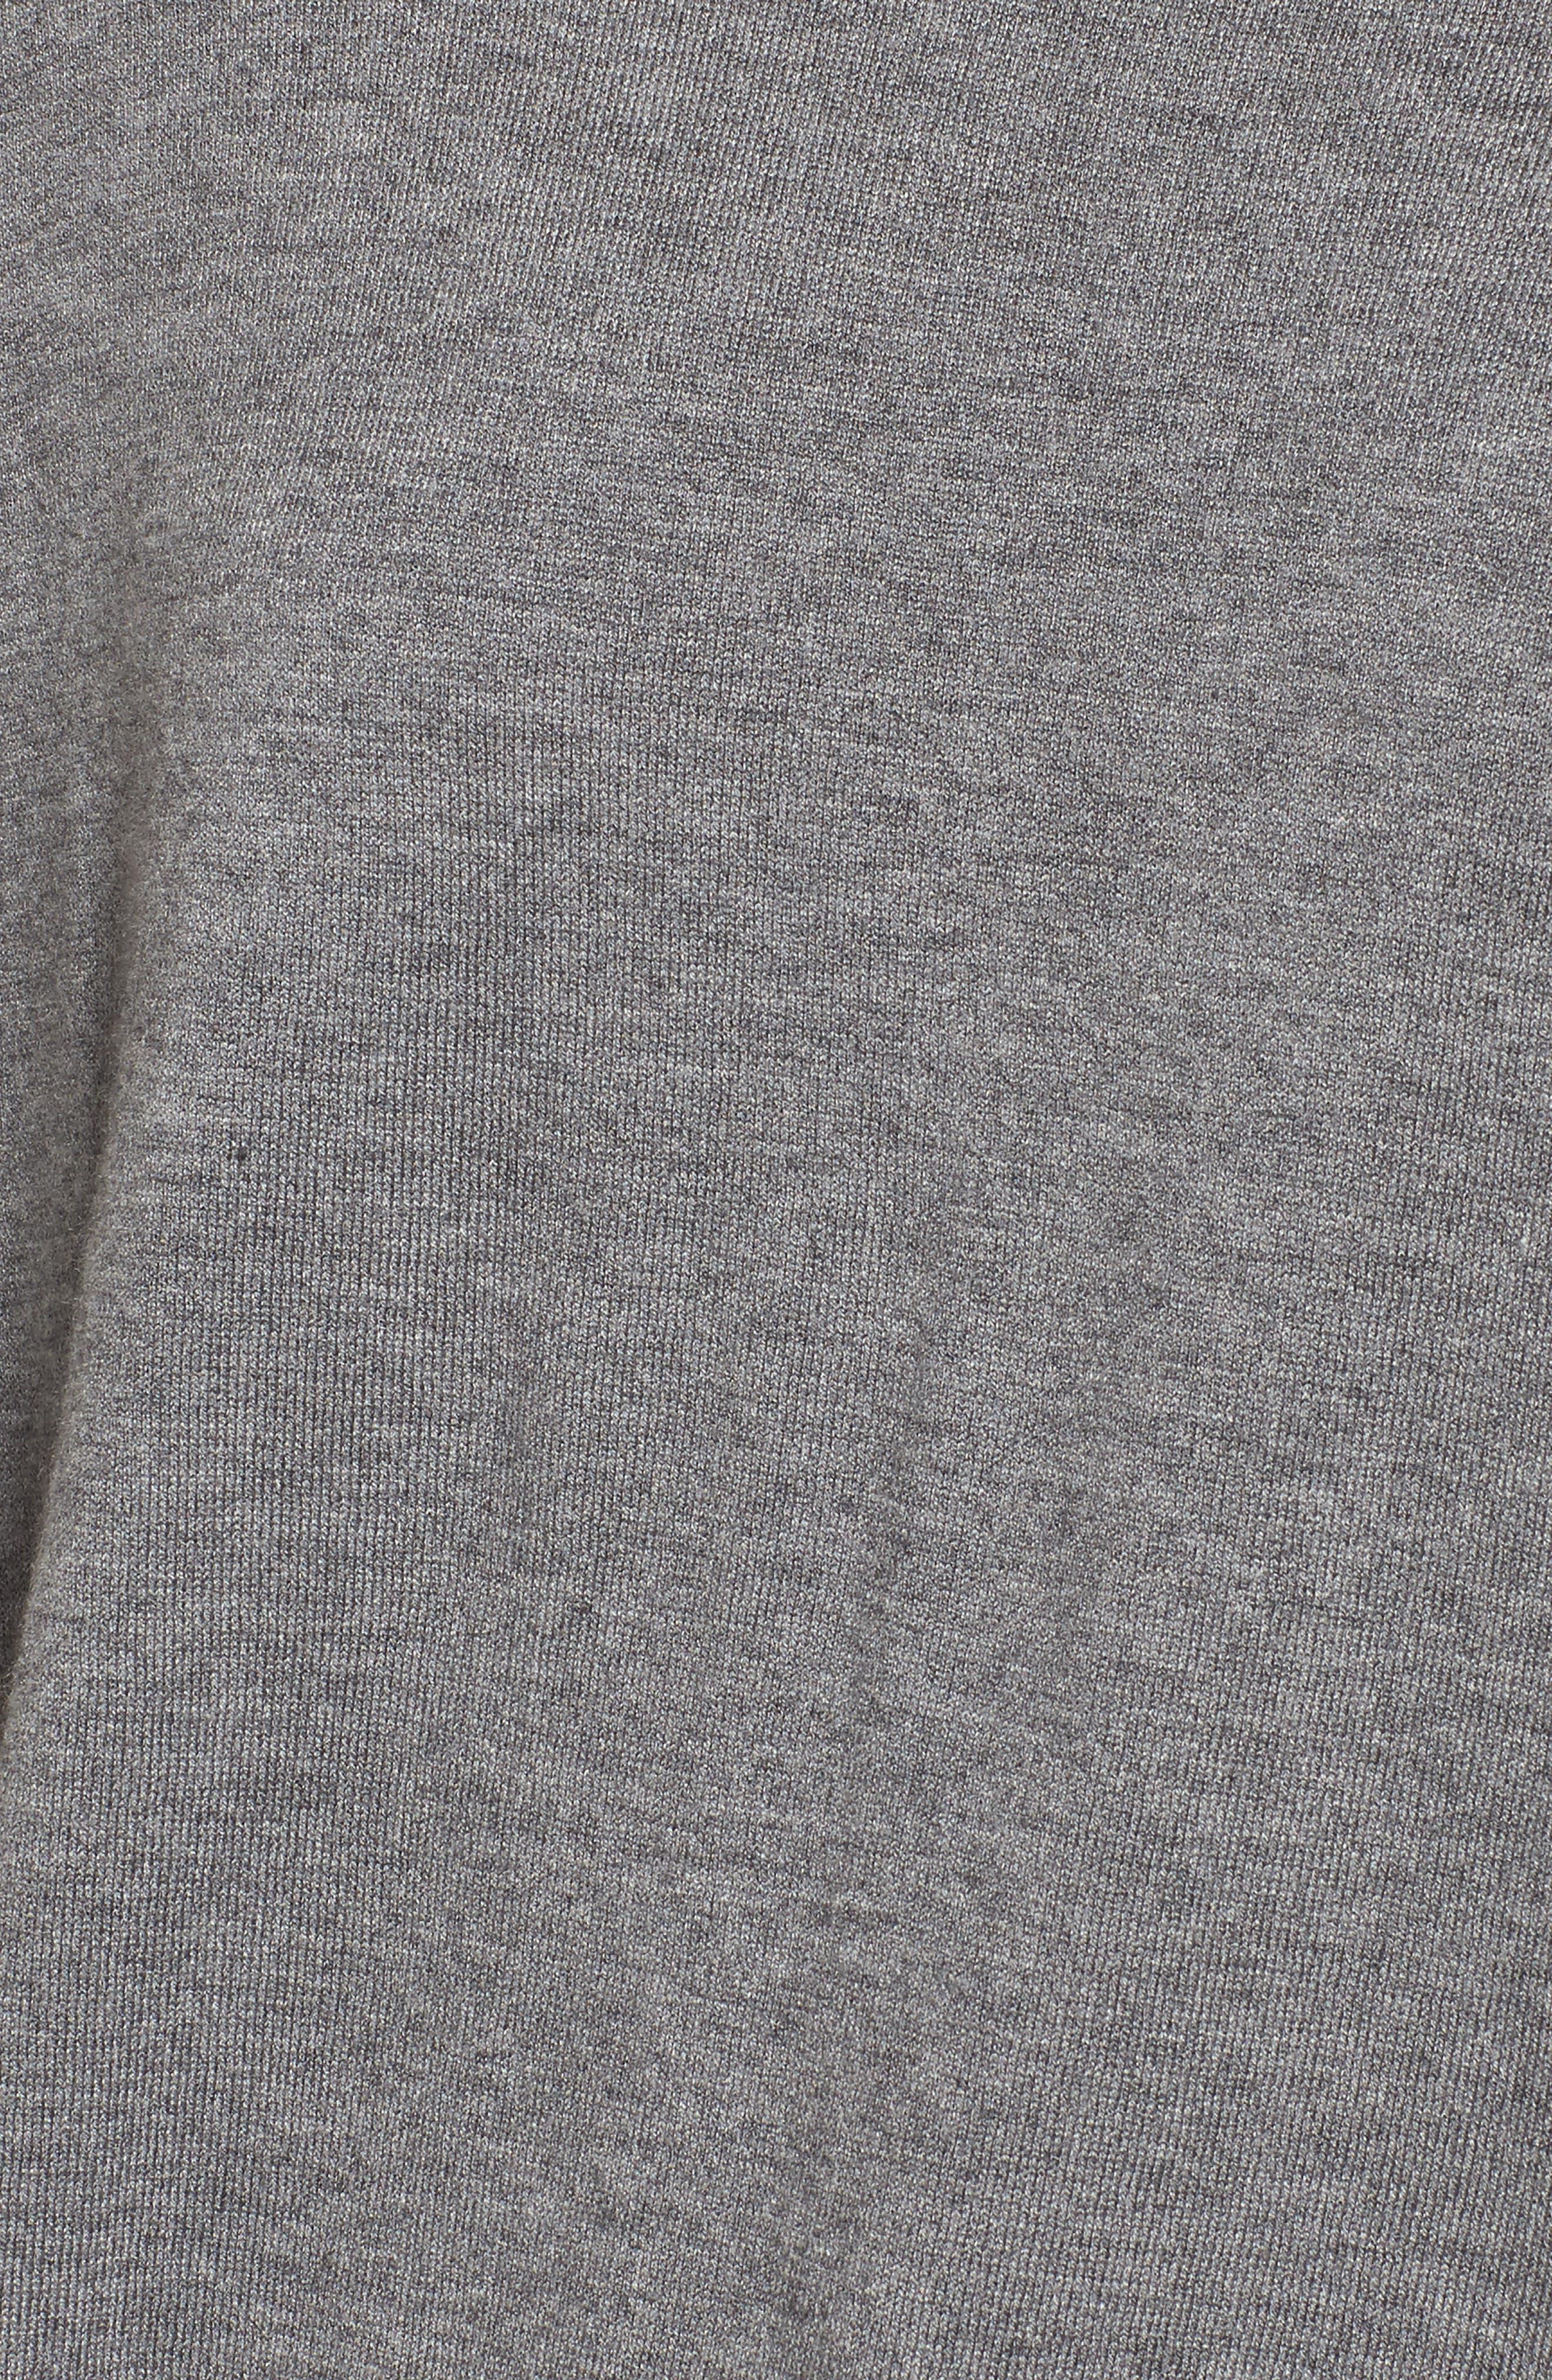 Canarise Cutout Sweater,                             Alternate thumbnail 5, color,                             Heather Cinder